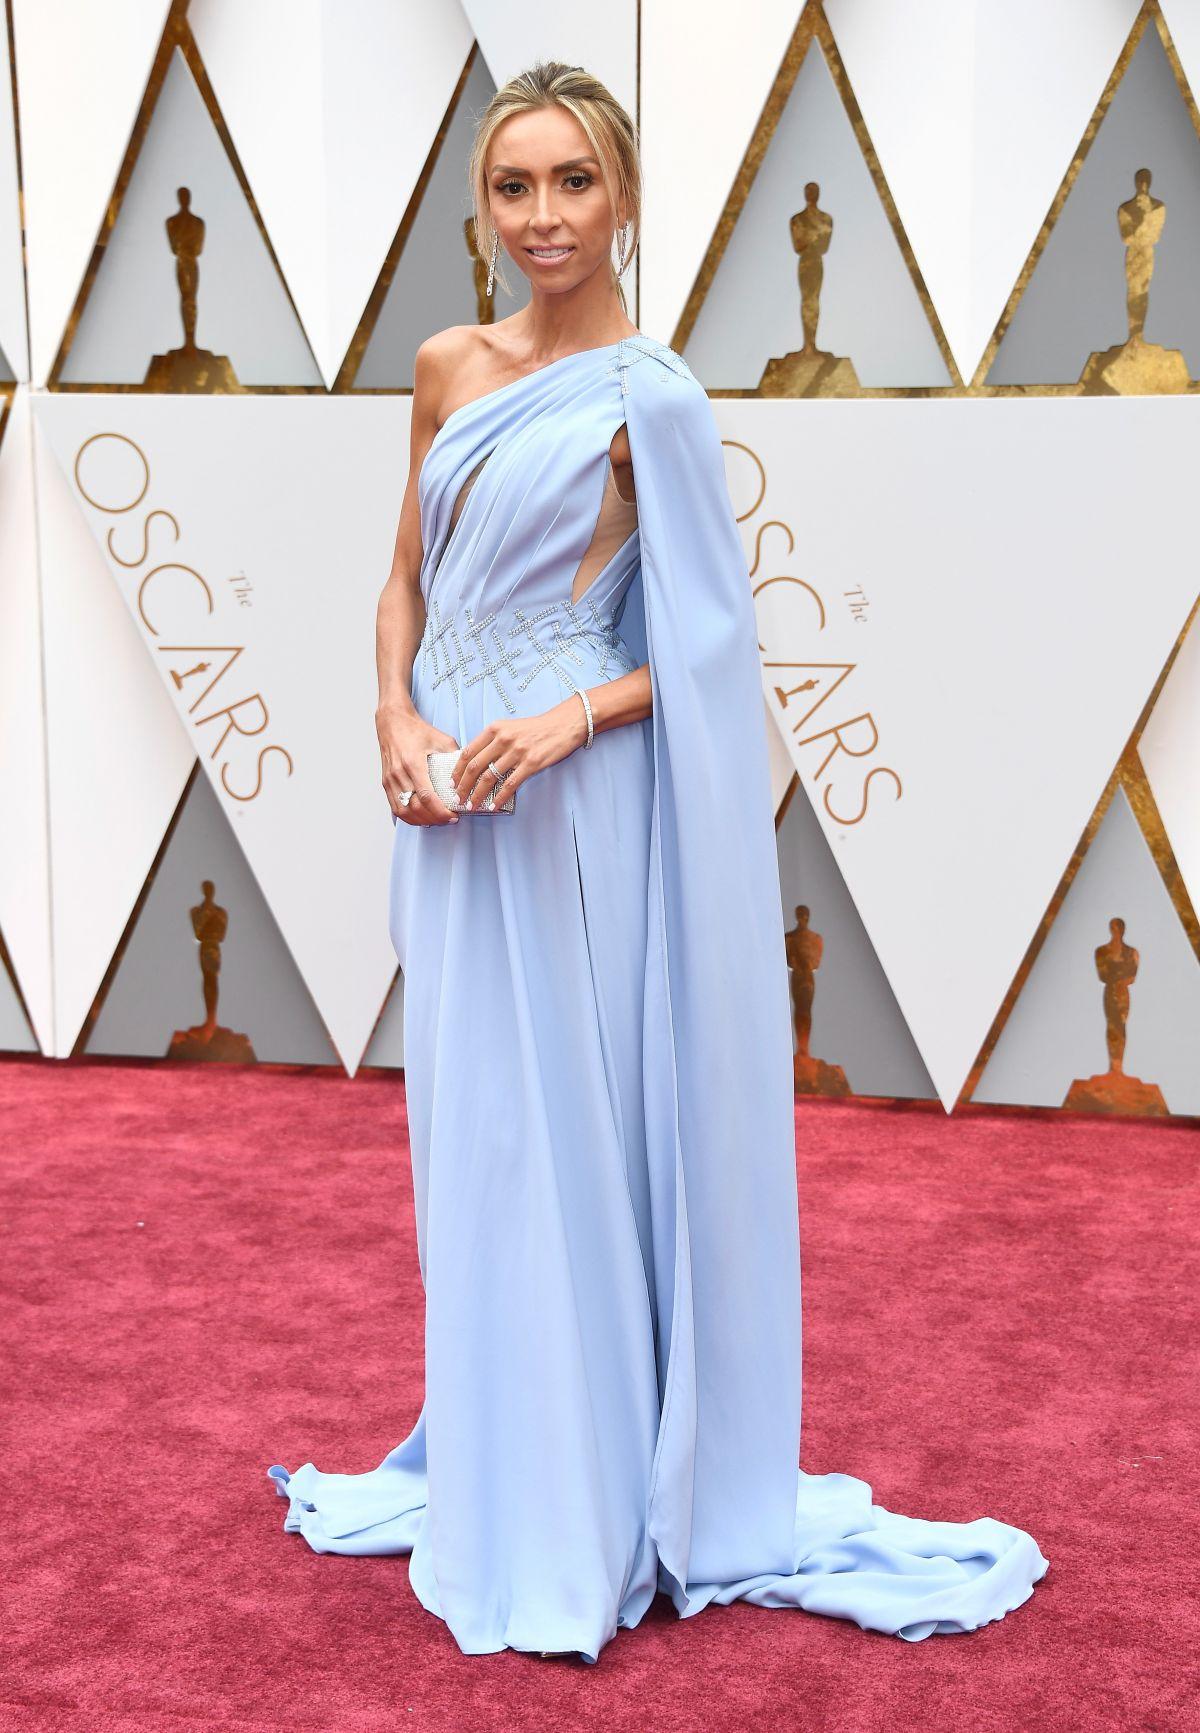 GIULIANA RANCIC at 89th Annual Academy Awards in Hollywood 02/26/2017